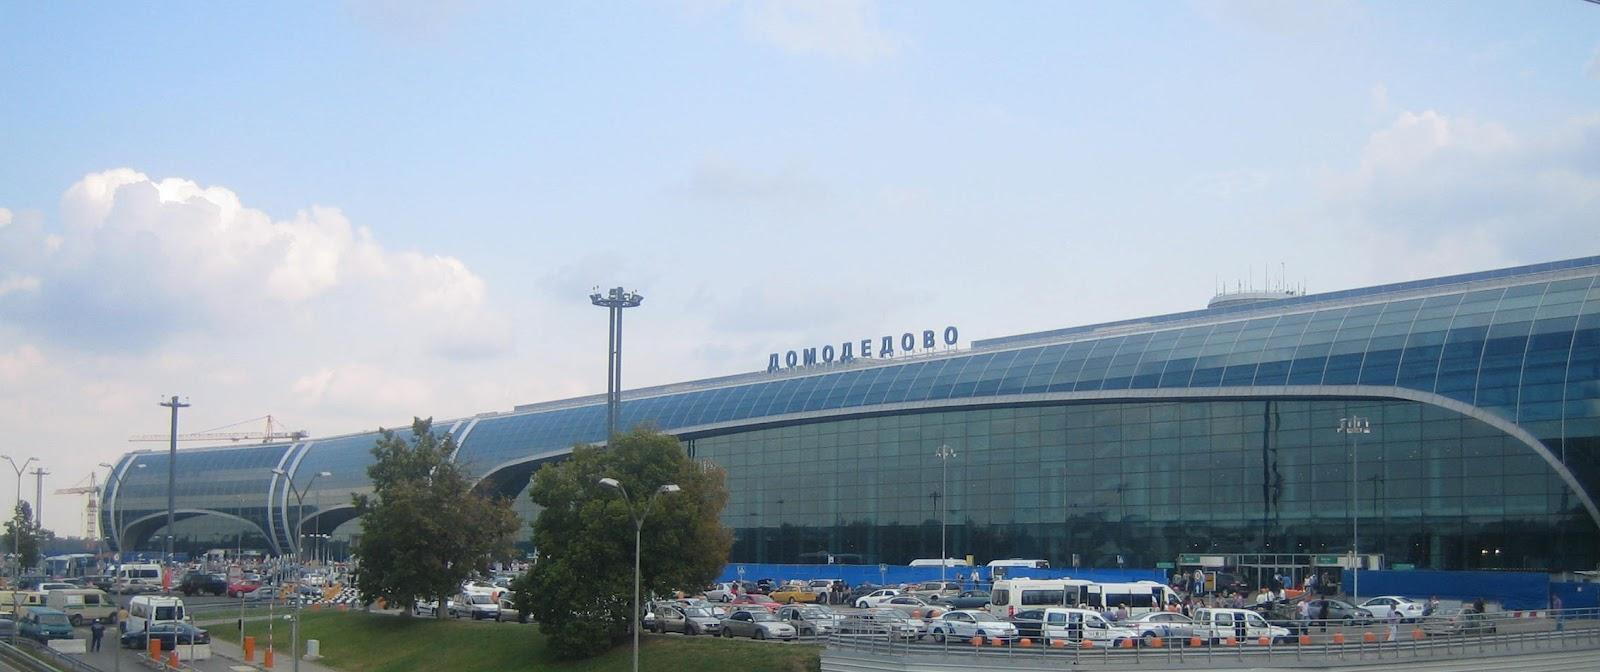 шереметьево москва схема аэропорта